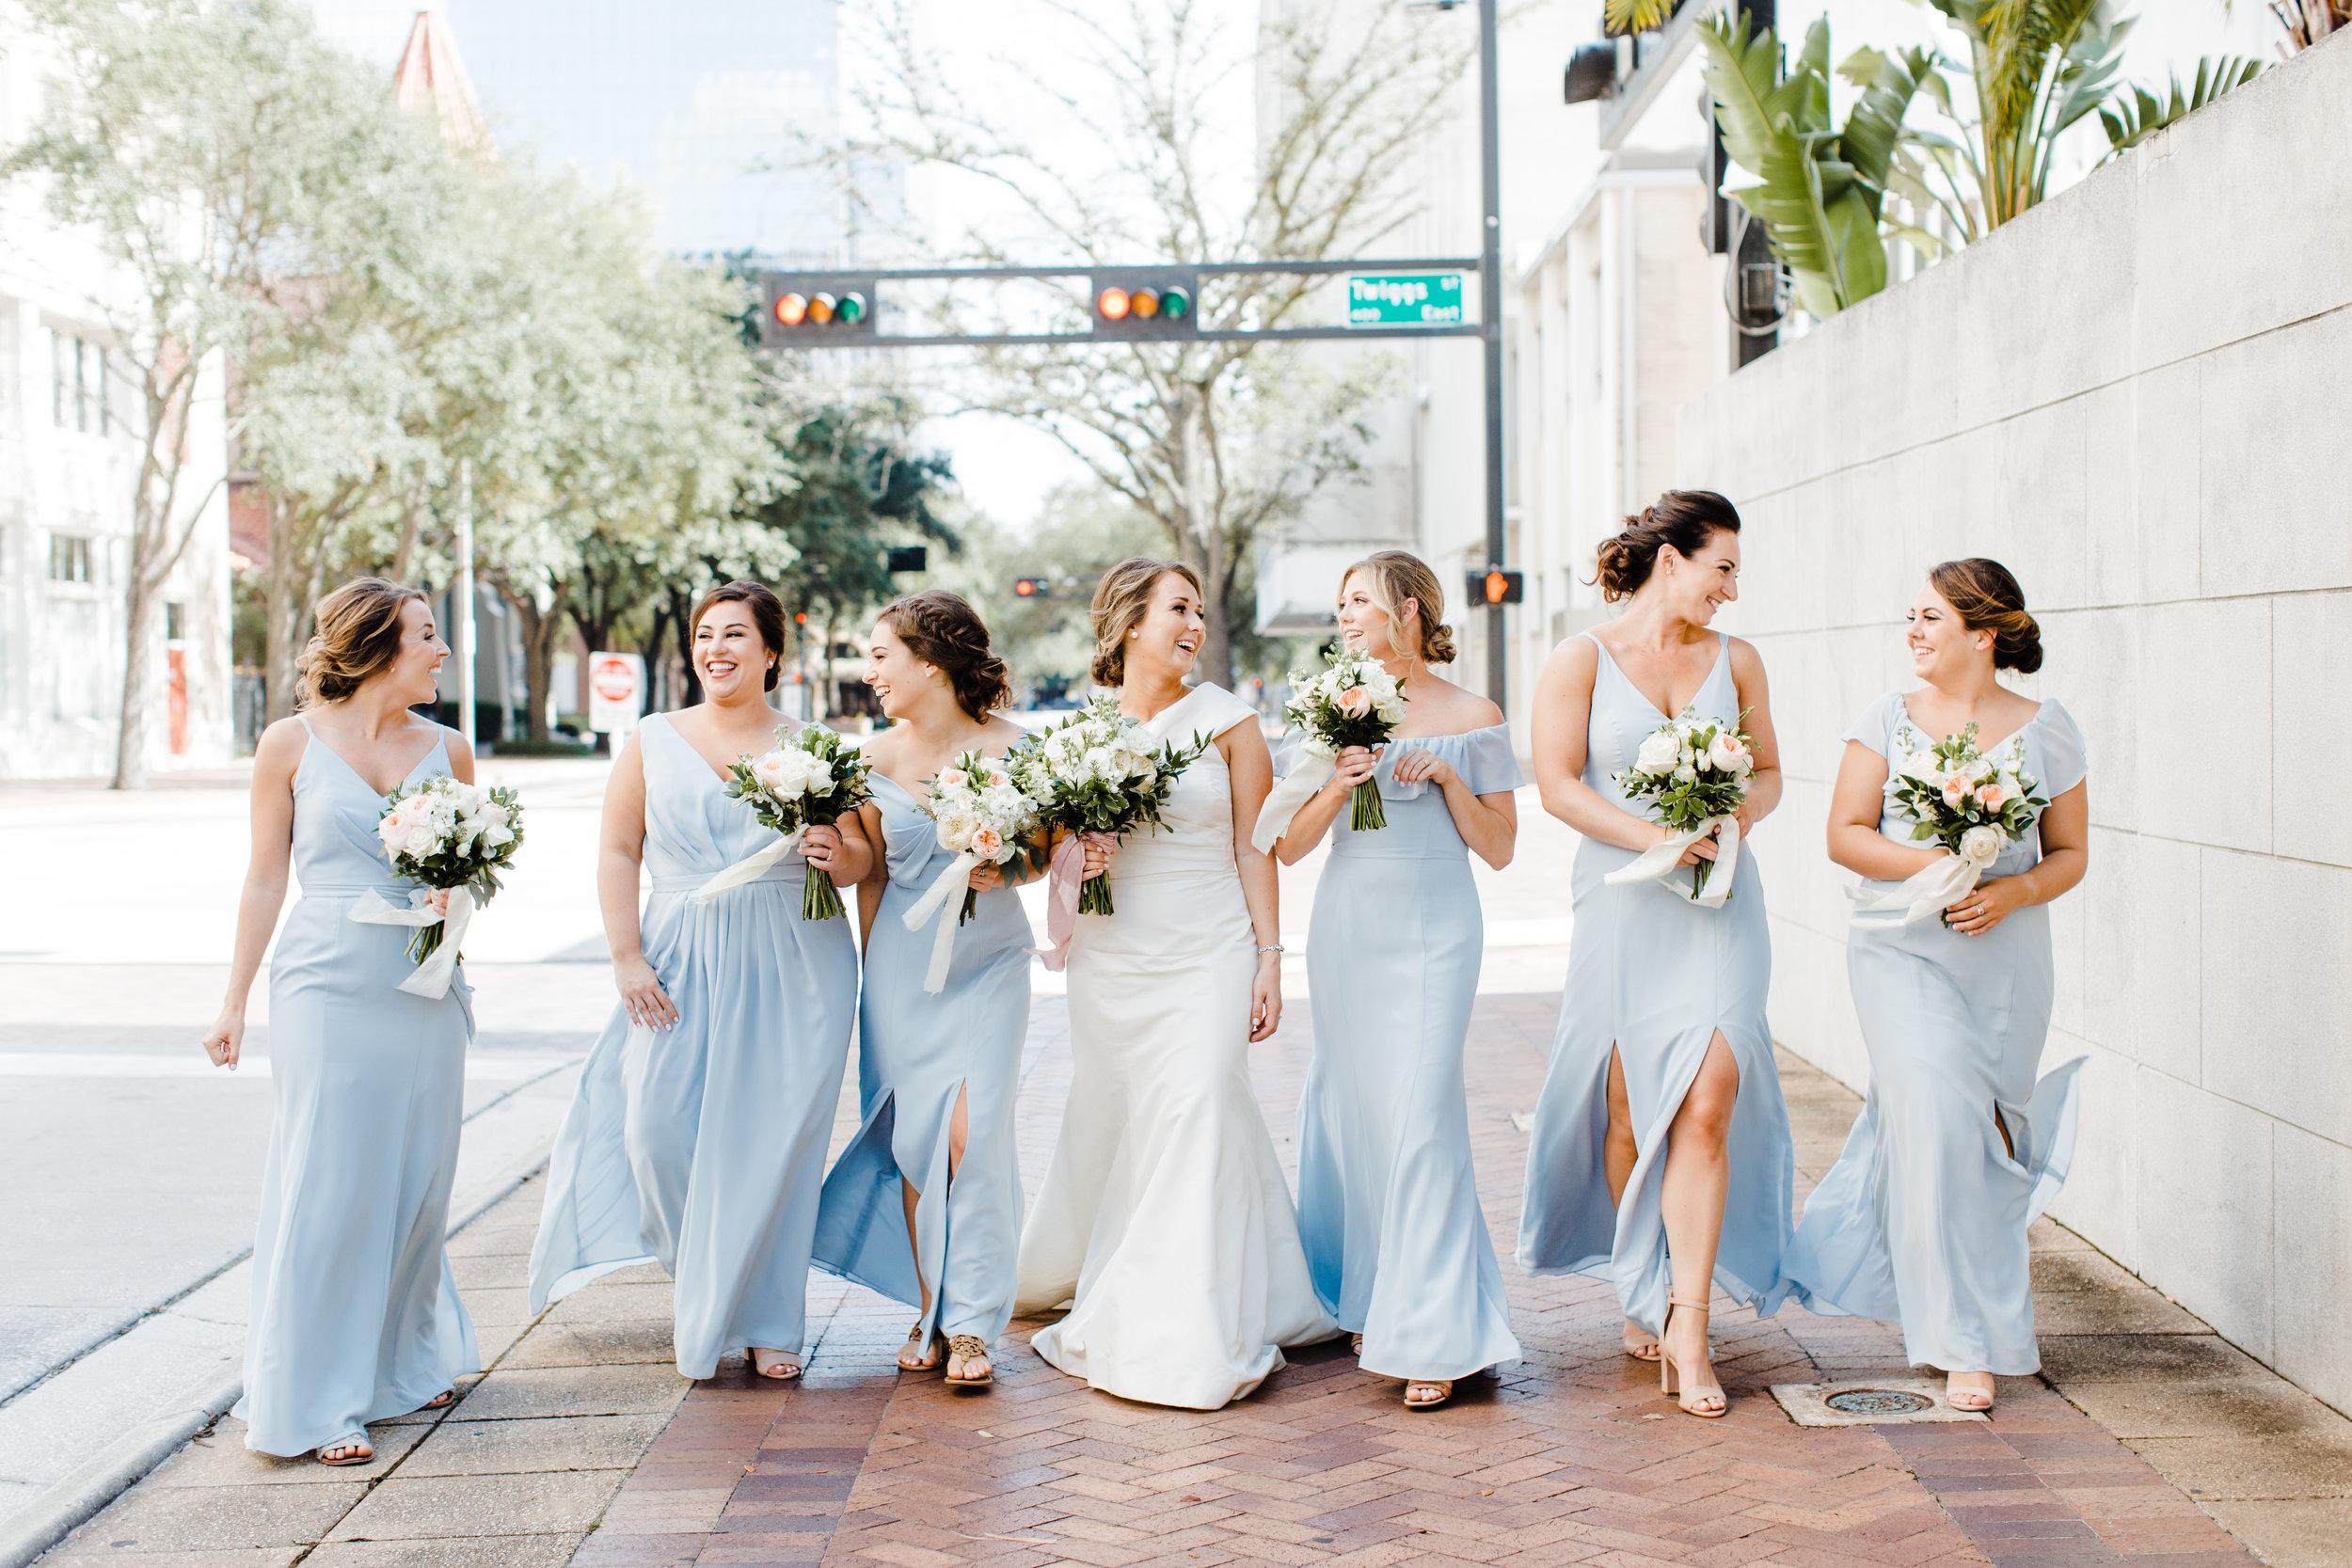 baby blue bridesmaids dresses